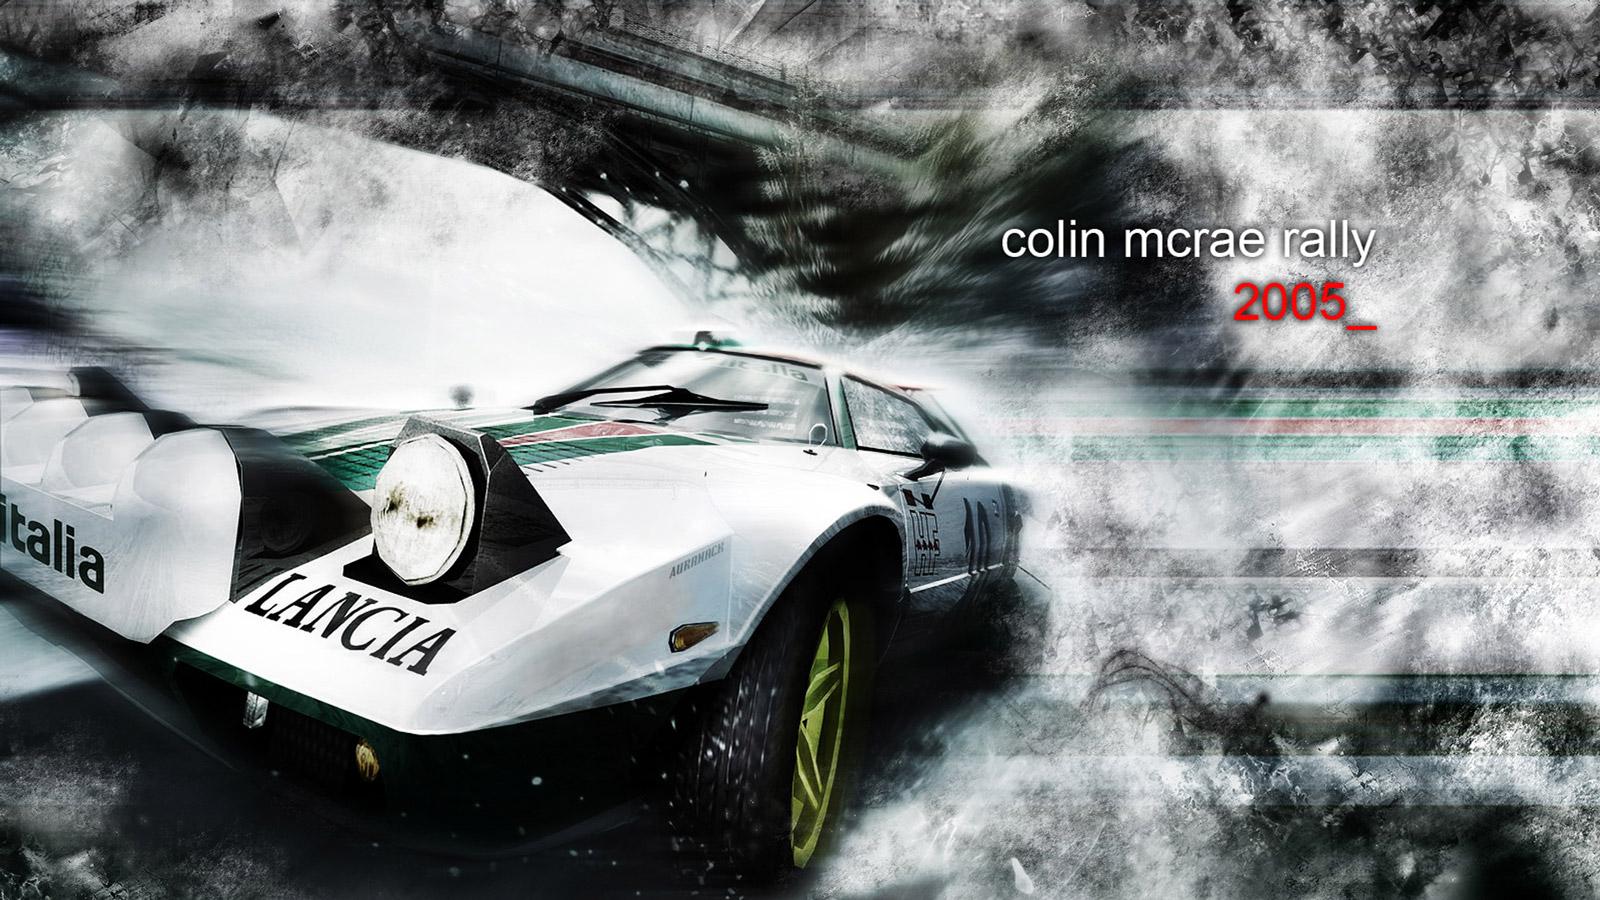 Free Colin McRae Rally 2005 Wallpaper in 1600x900